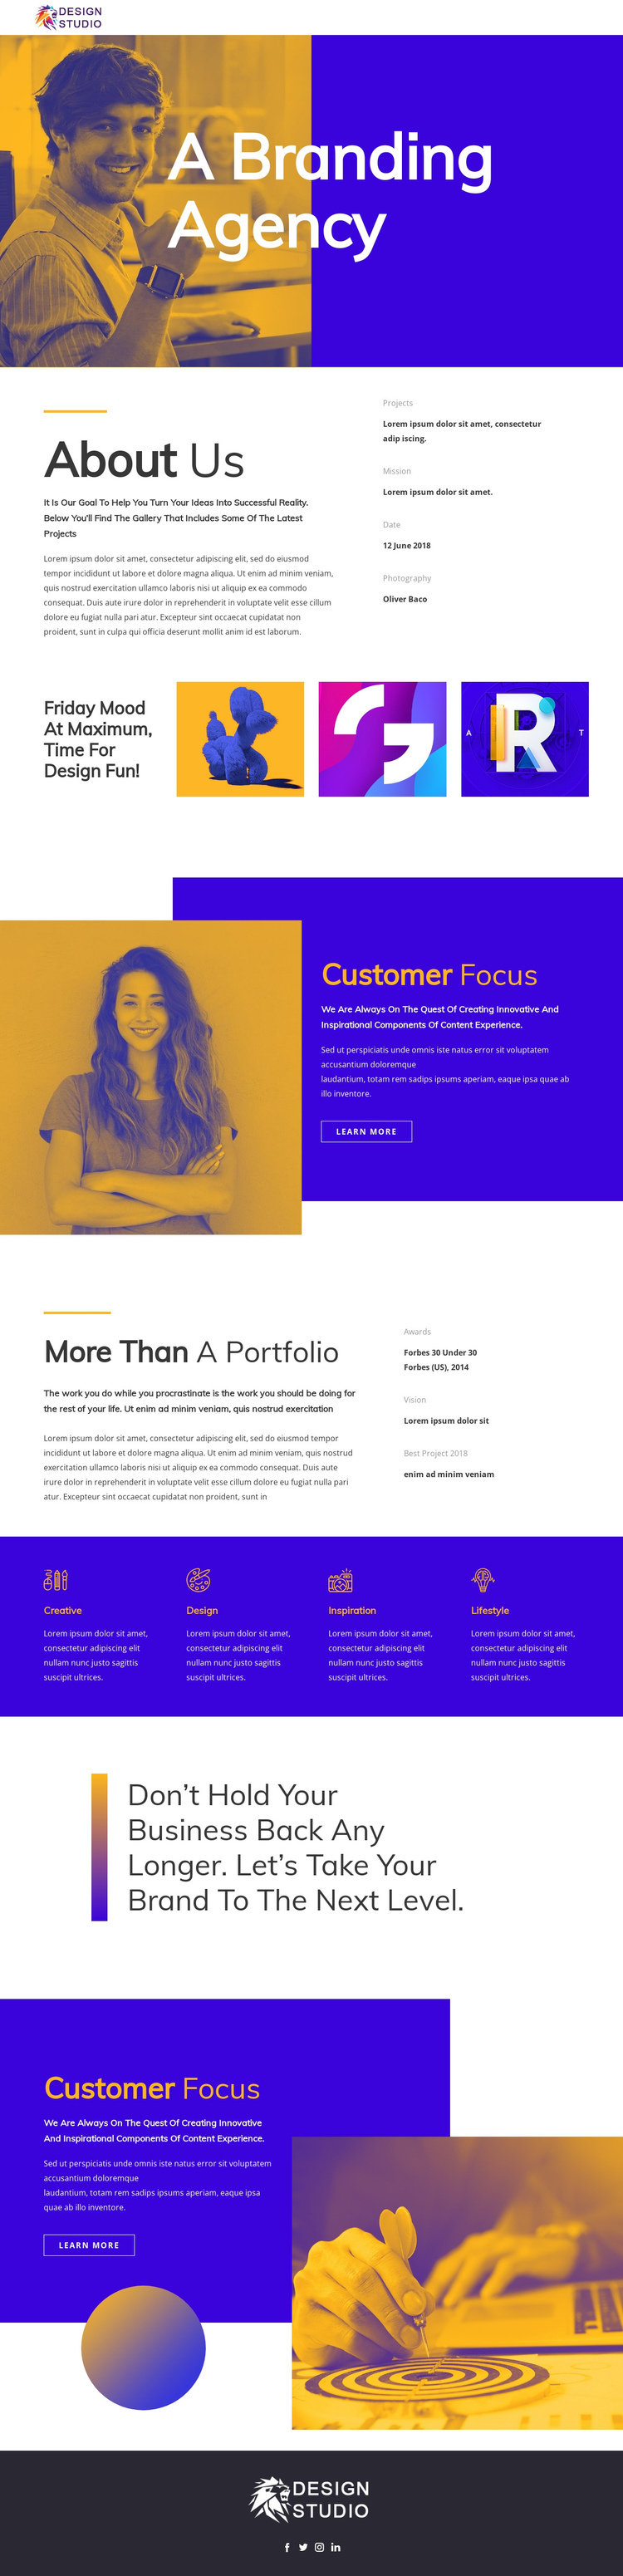 Branding agency for startup Website Builder Software